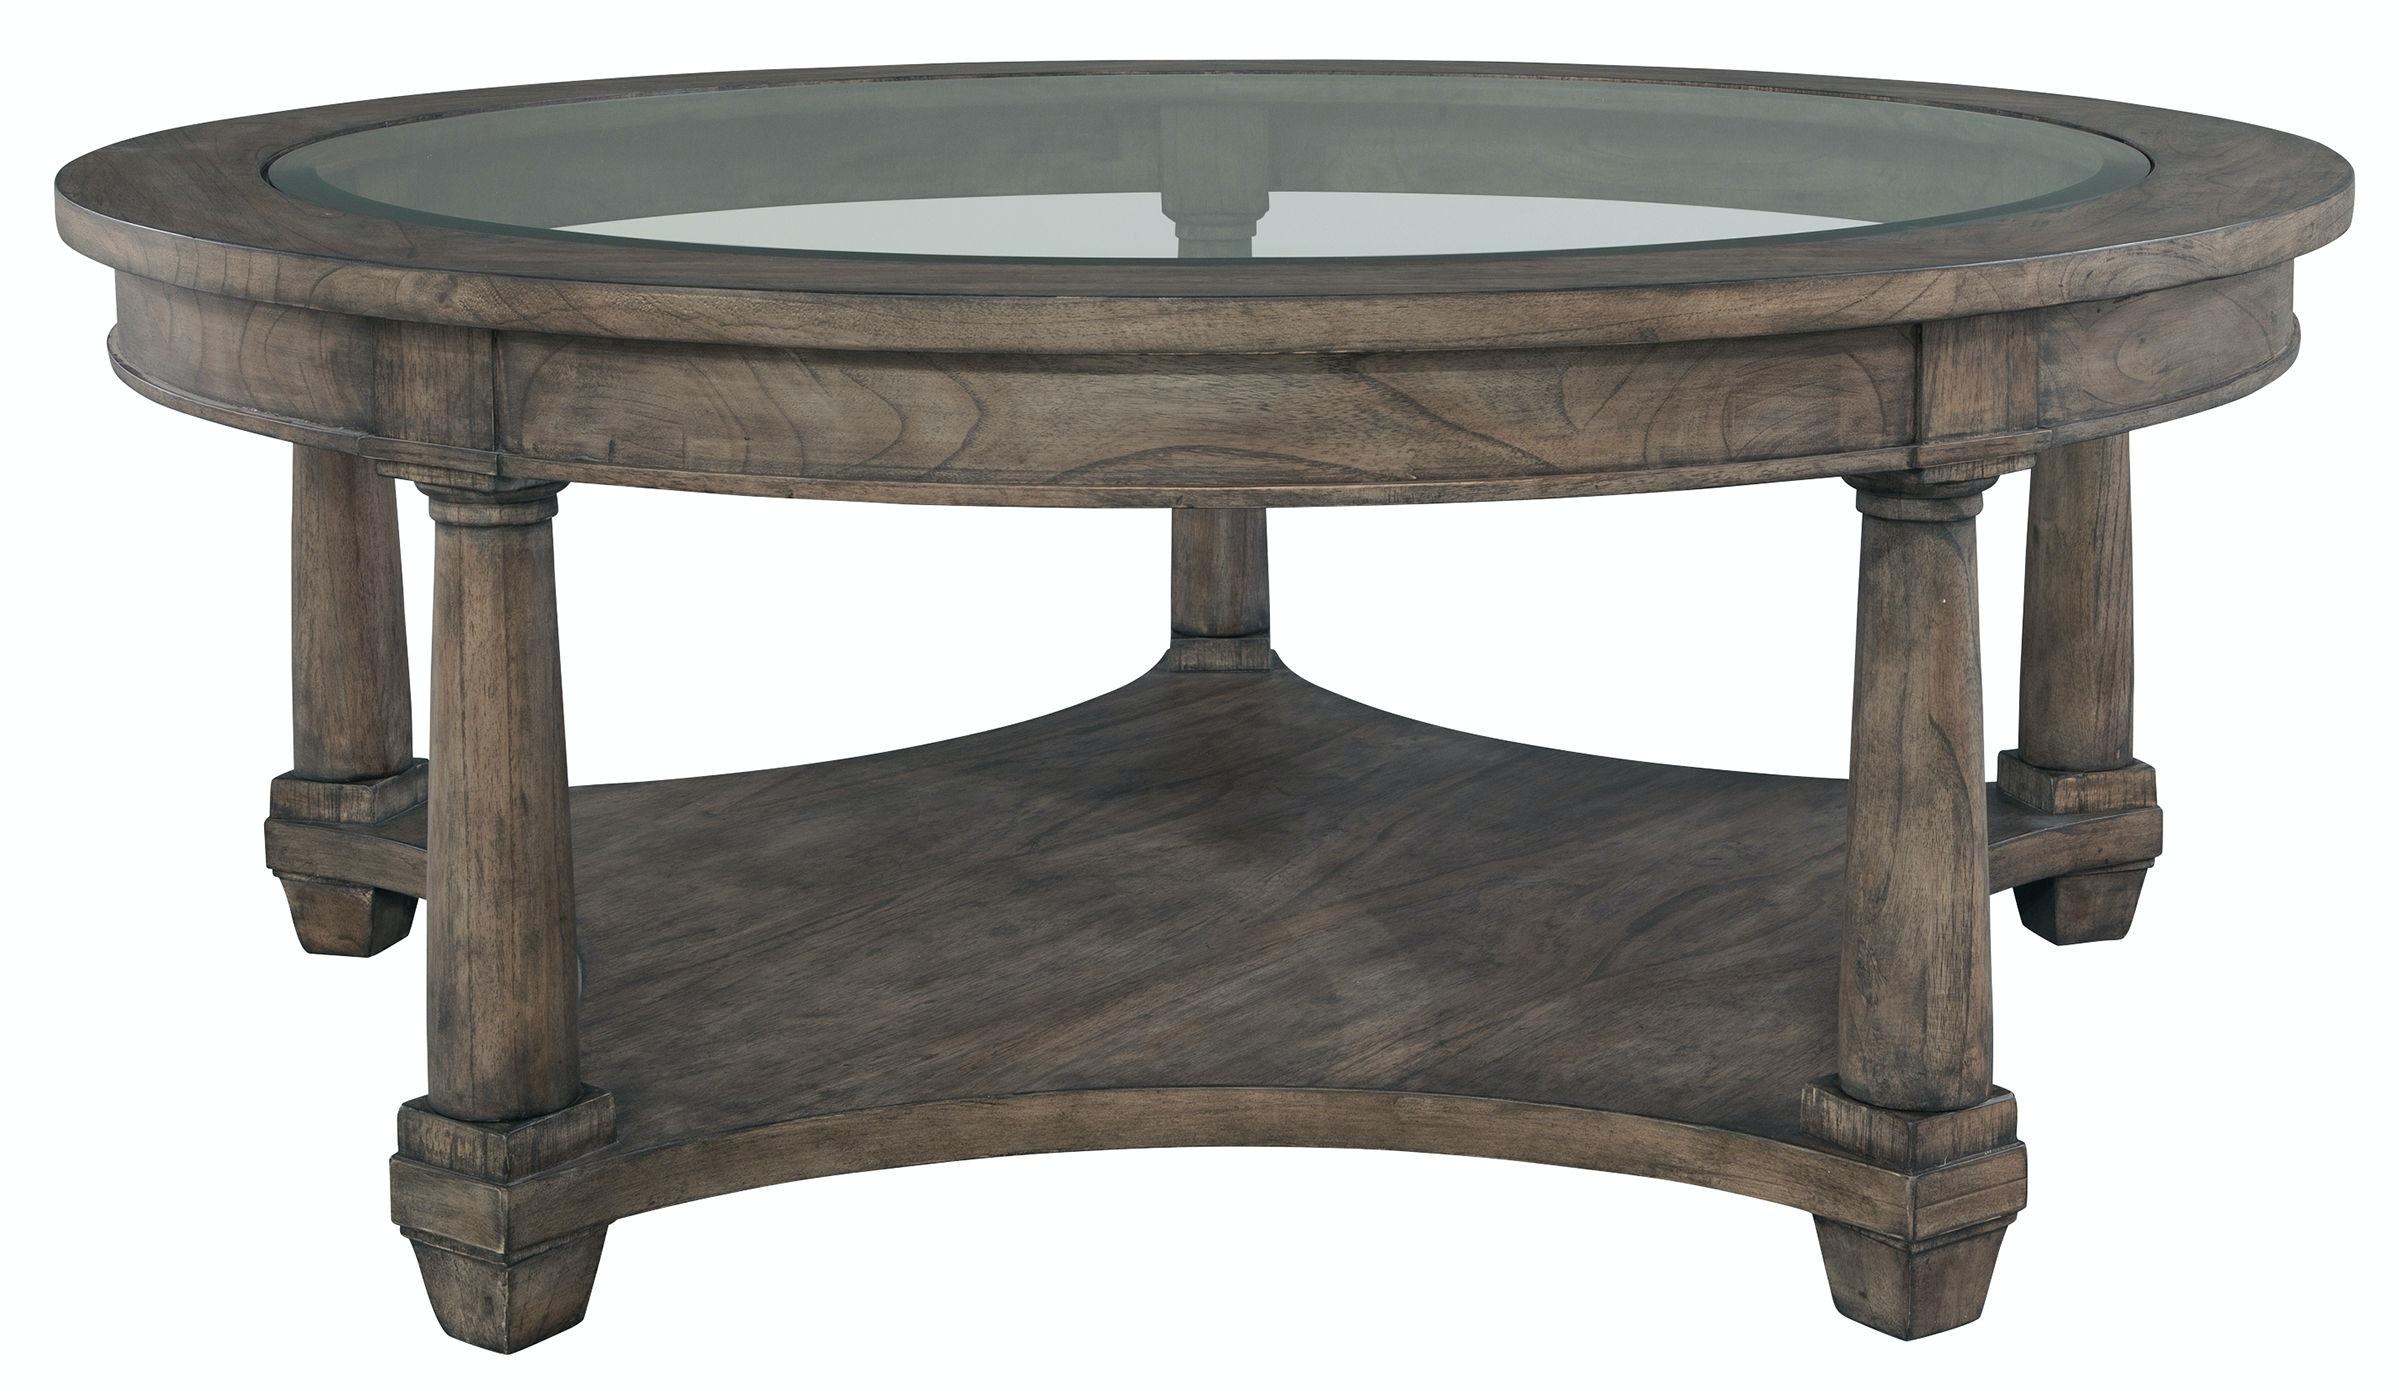 Hekman Round Coffee Table 23502